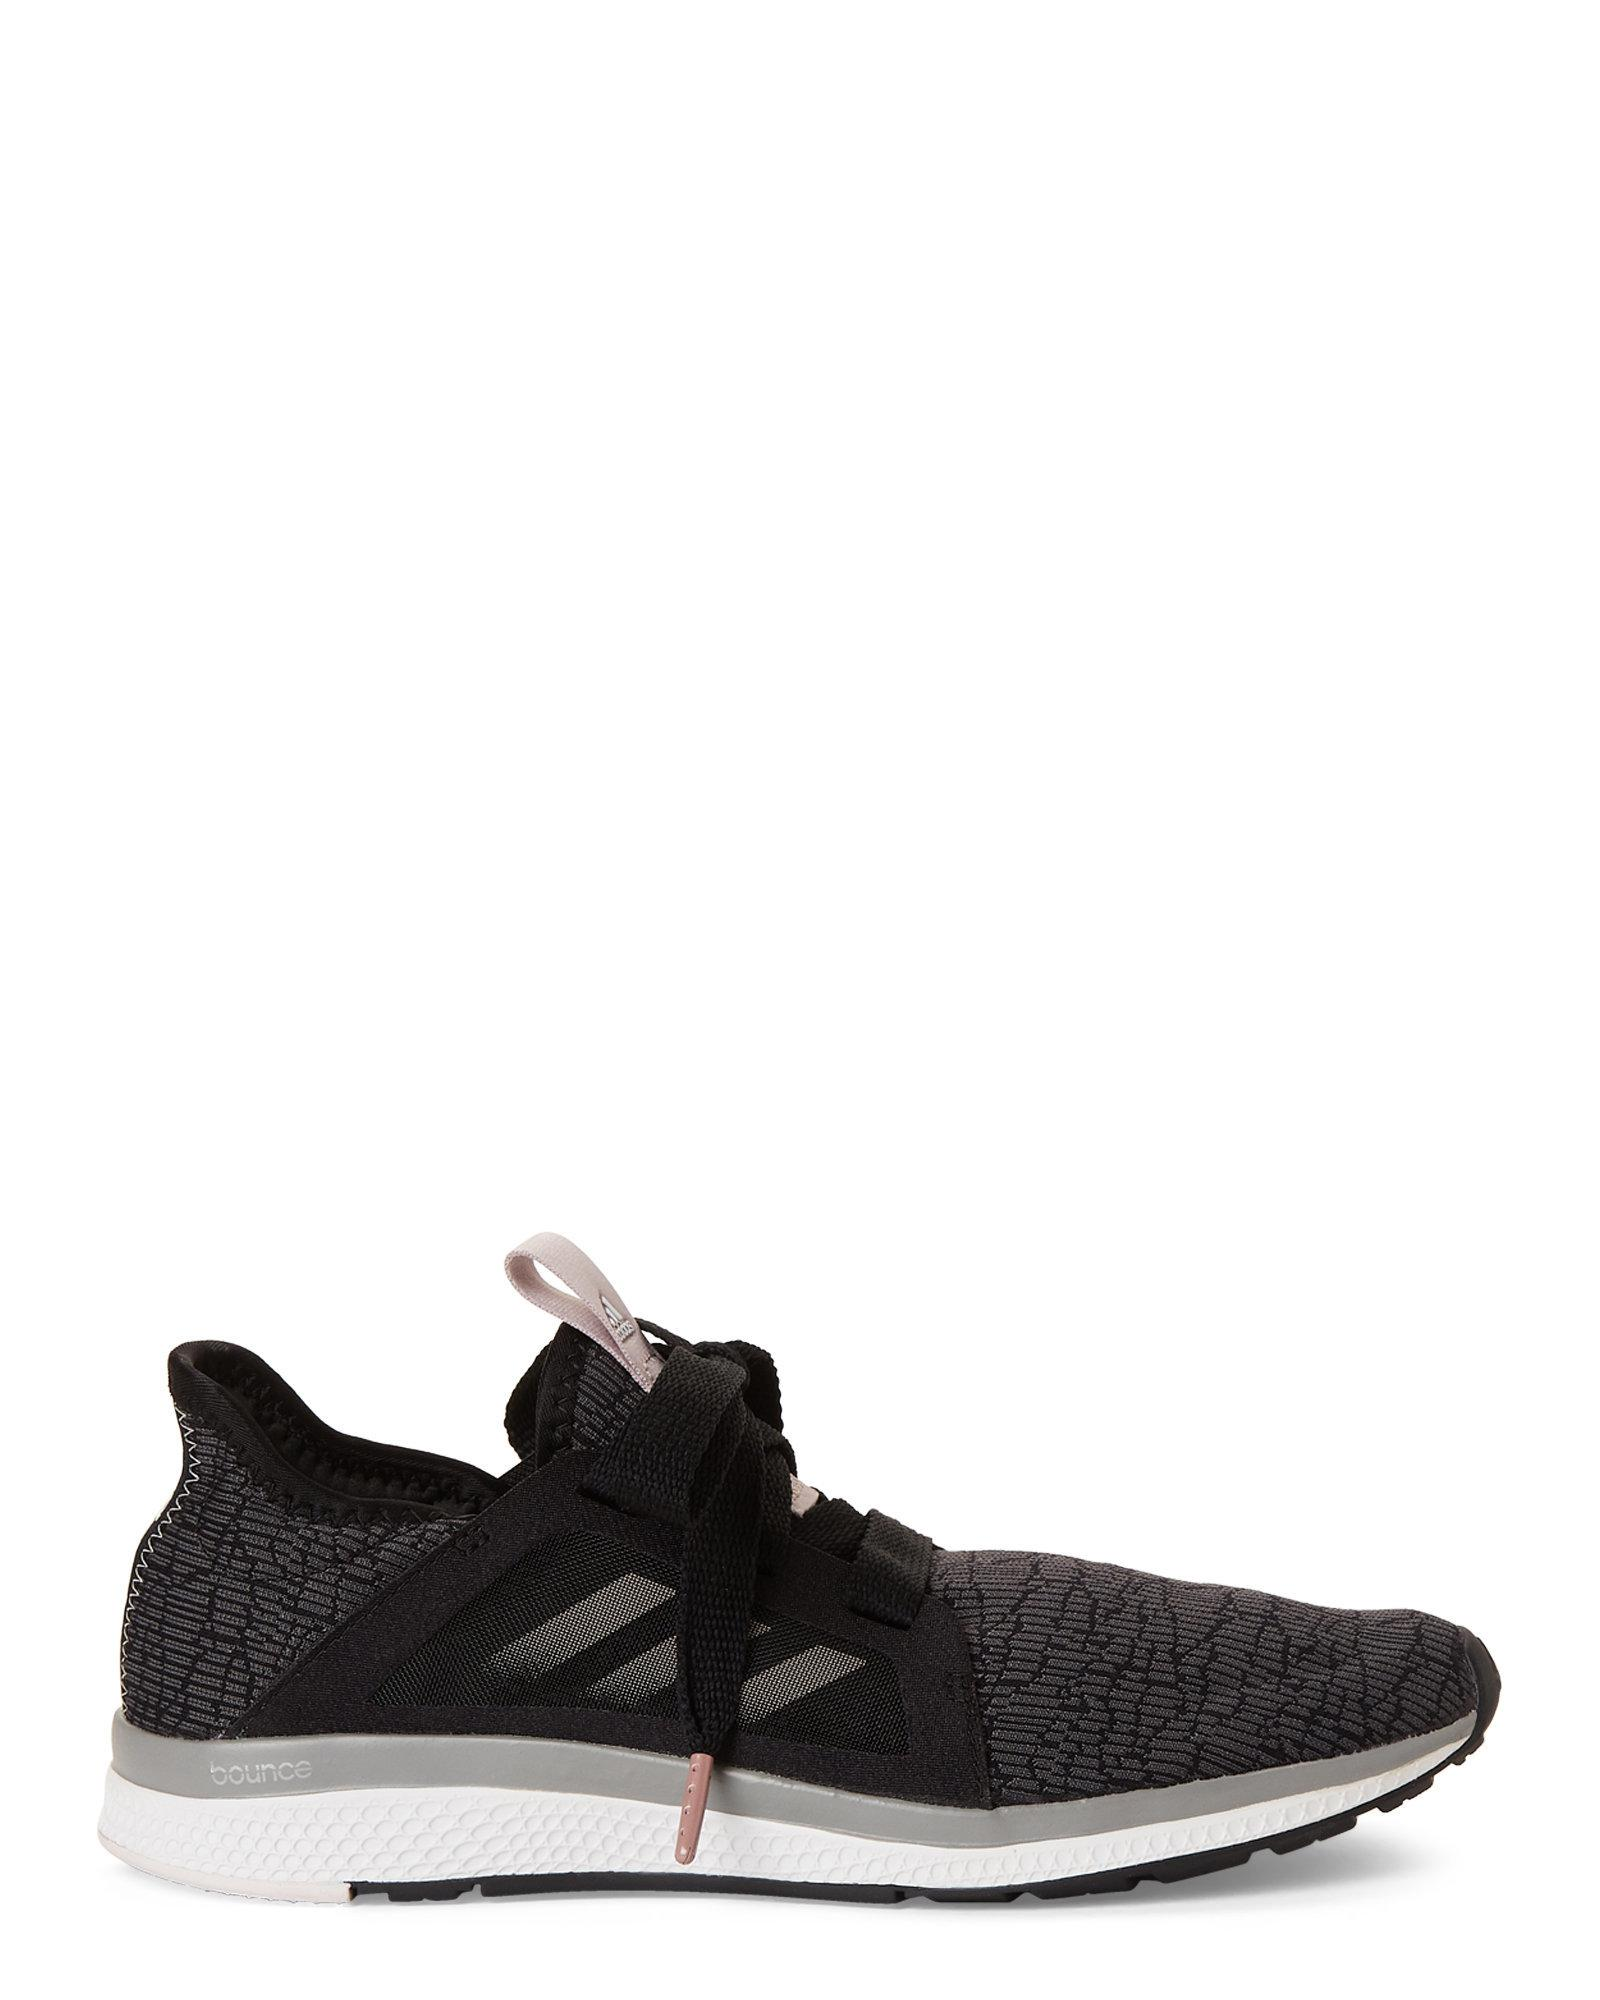 sale retailer 6ae84 83bef Lyst - Adidas Black  Vapor Grey Edge Lux Knit Running Sneake